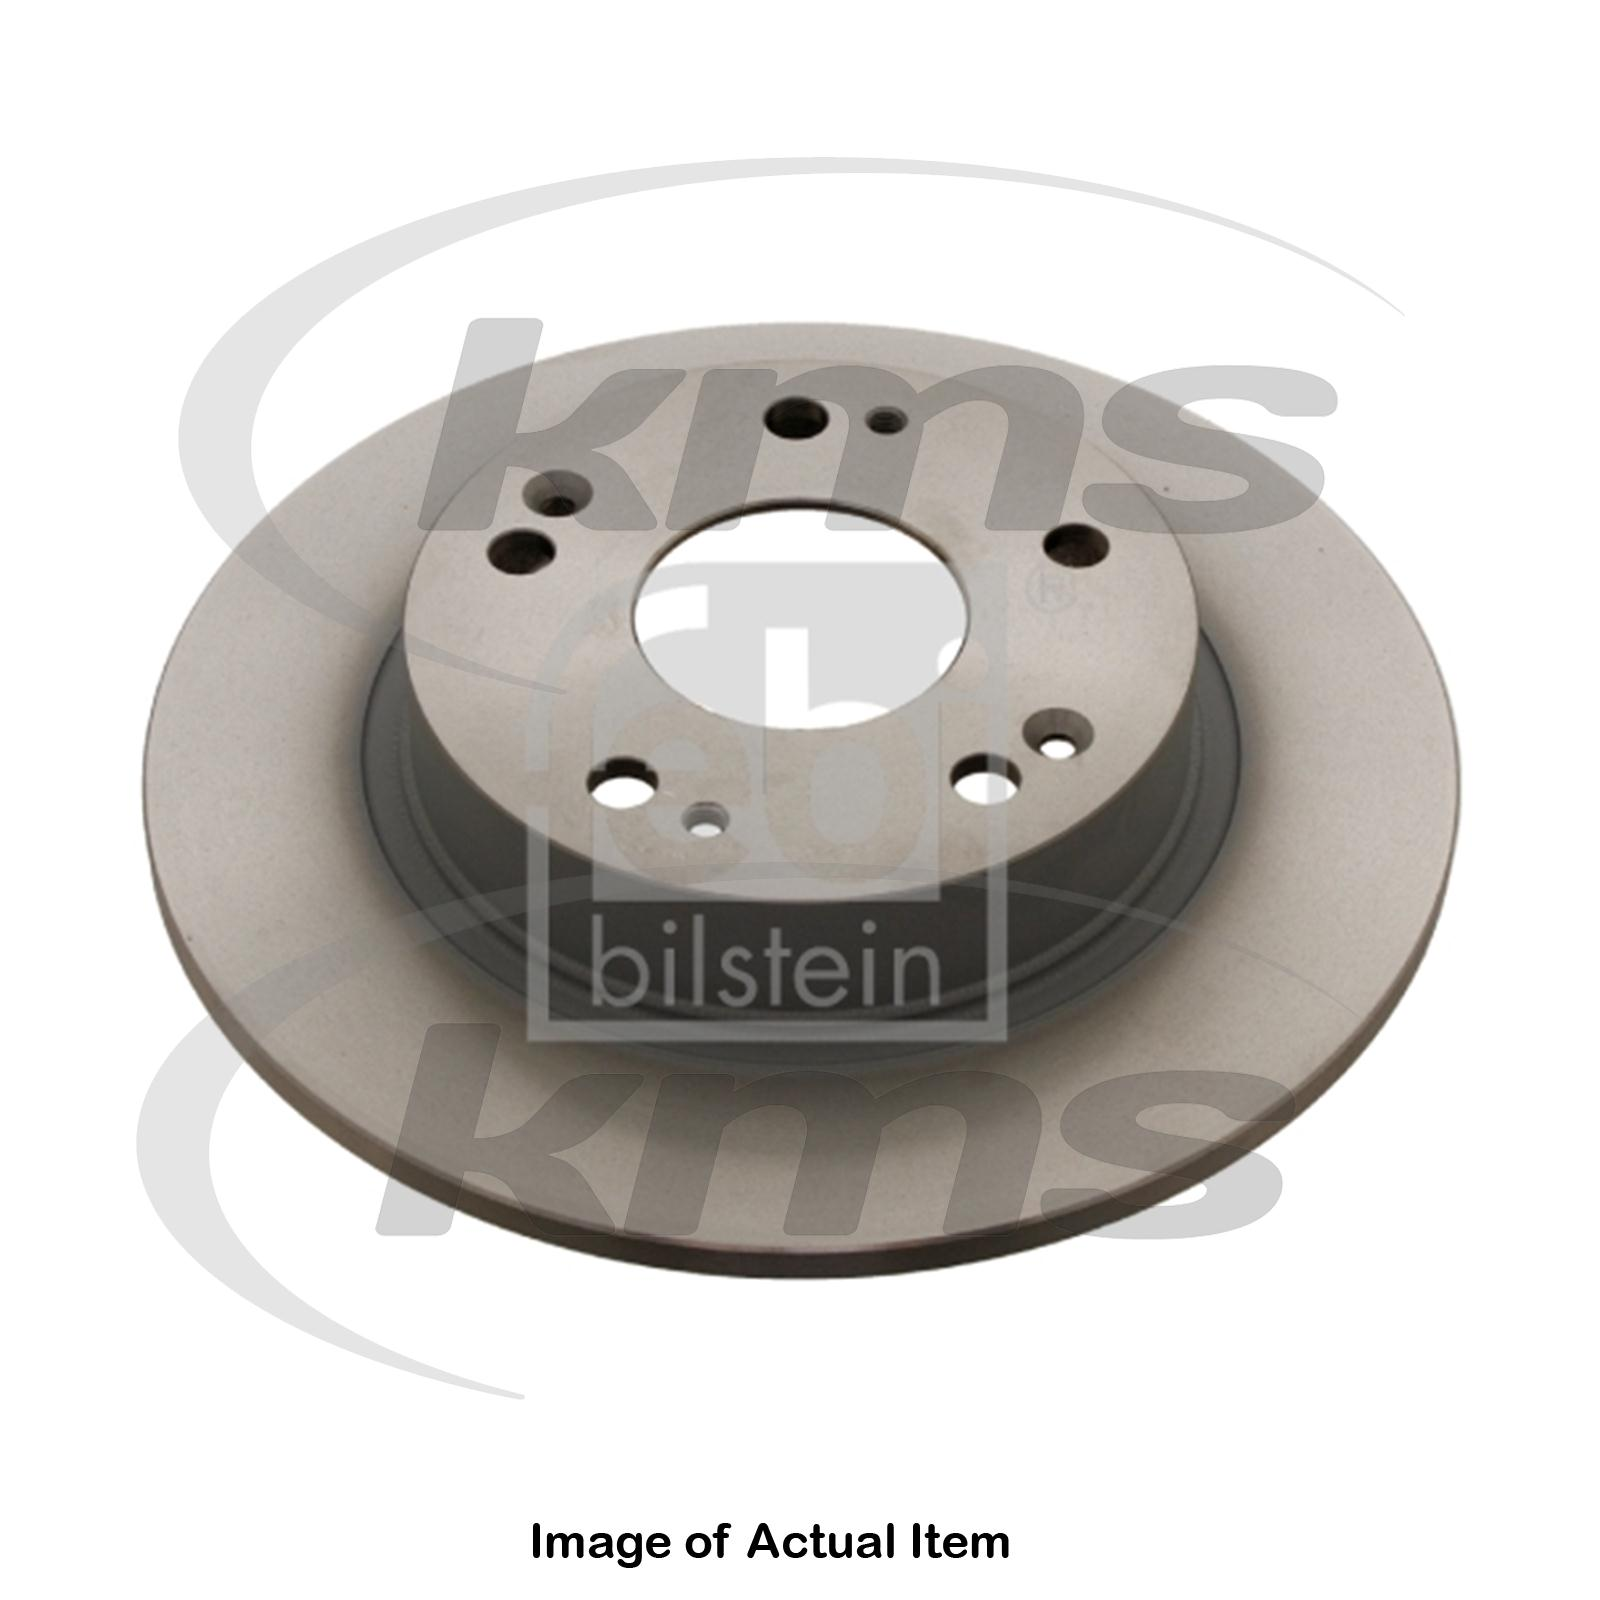 Precision 16 x Black Chrome Wheel Bolts Set with 4 x Locking Nuts for Śkoda Superb with Aftermarket Alloy Wheels Only PN.SFP-16BM14B+B14B201